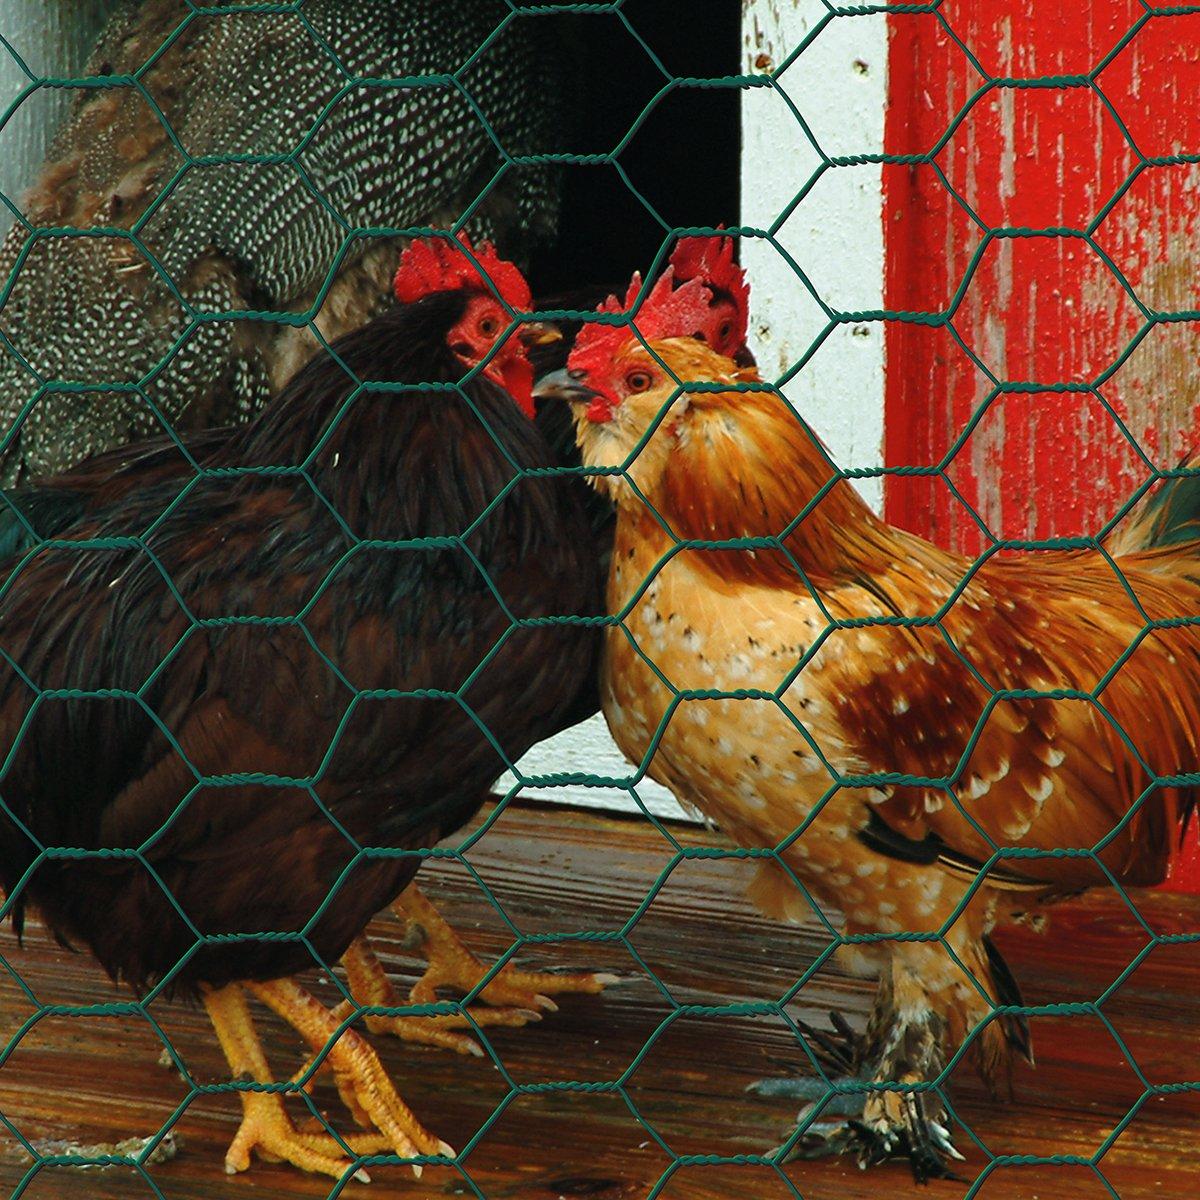 Garden Zone 24inx25ft 1in Green Vinyl Poultry Netting by Origin Point (Image #3)